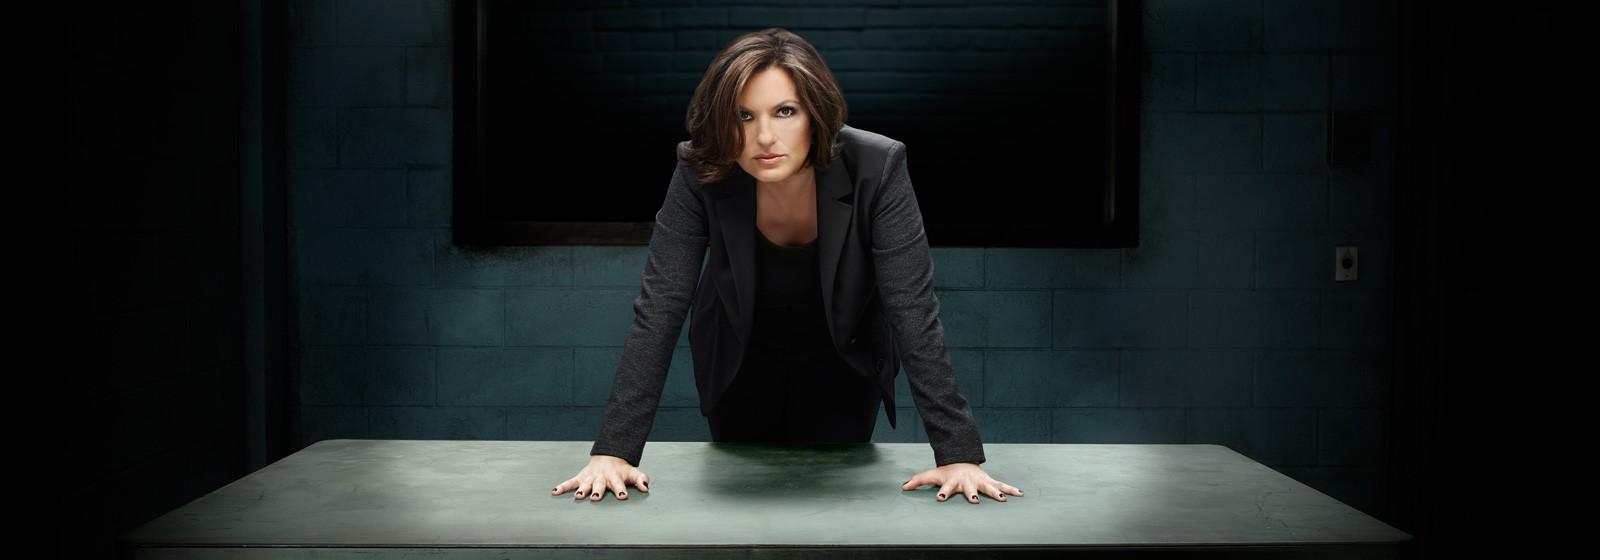 Law & Order: SVU | Nova temporada